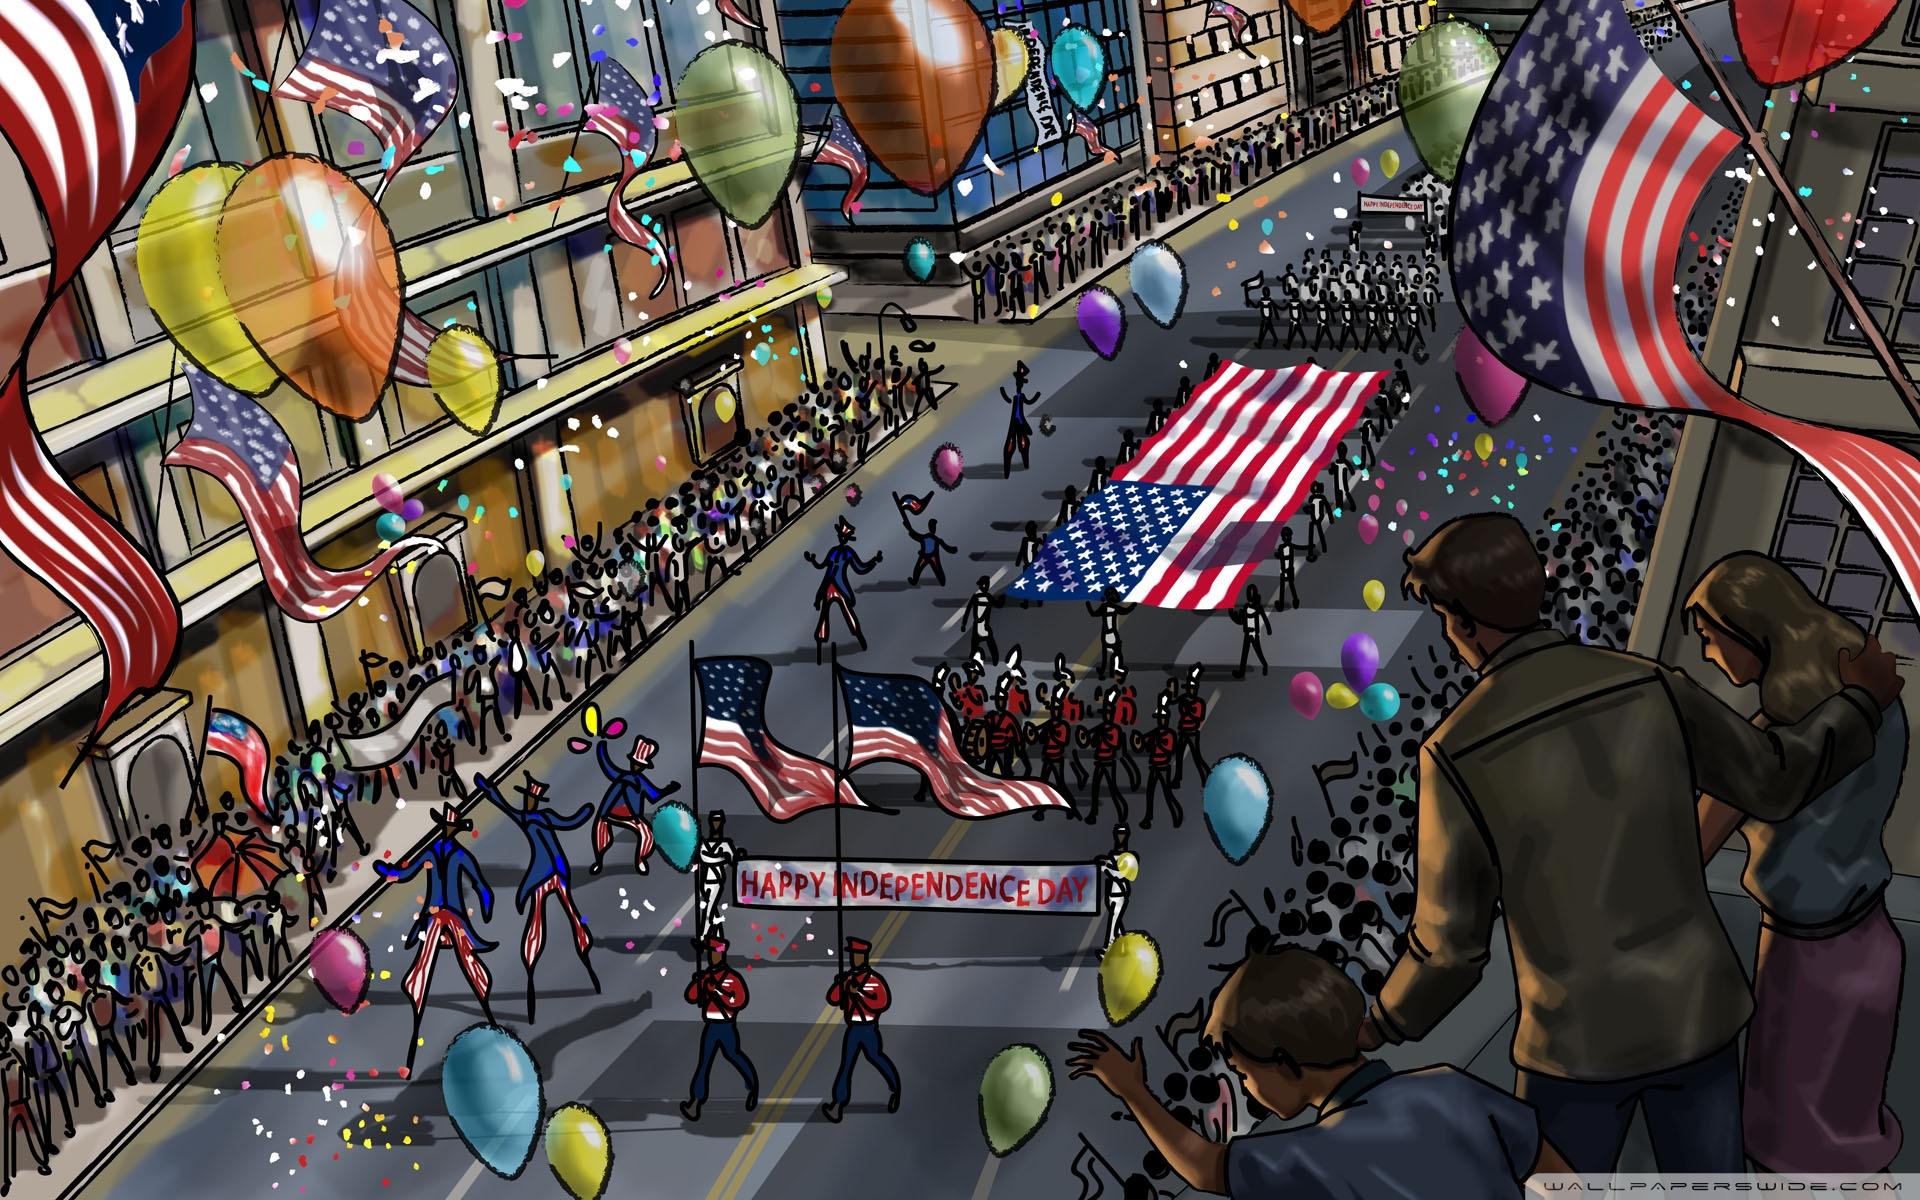 National Independence Day Parade 4K HD Desktop Wallpaper for 4K 1920x1200